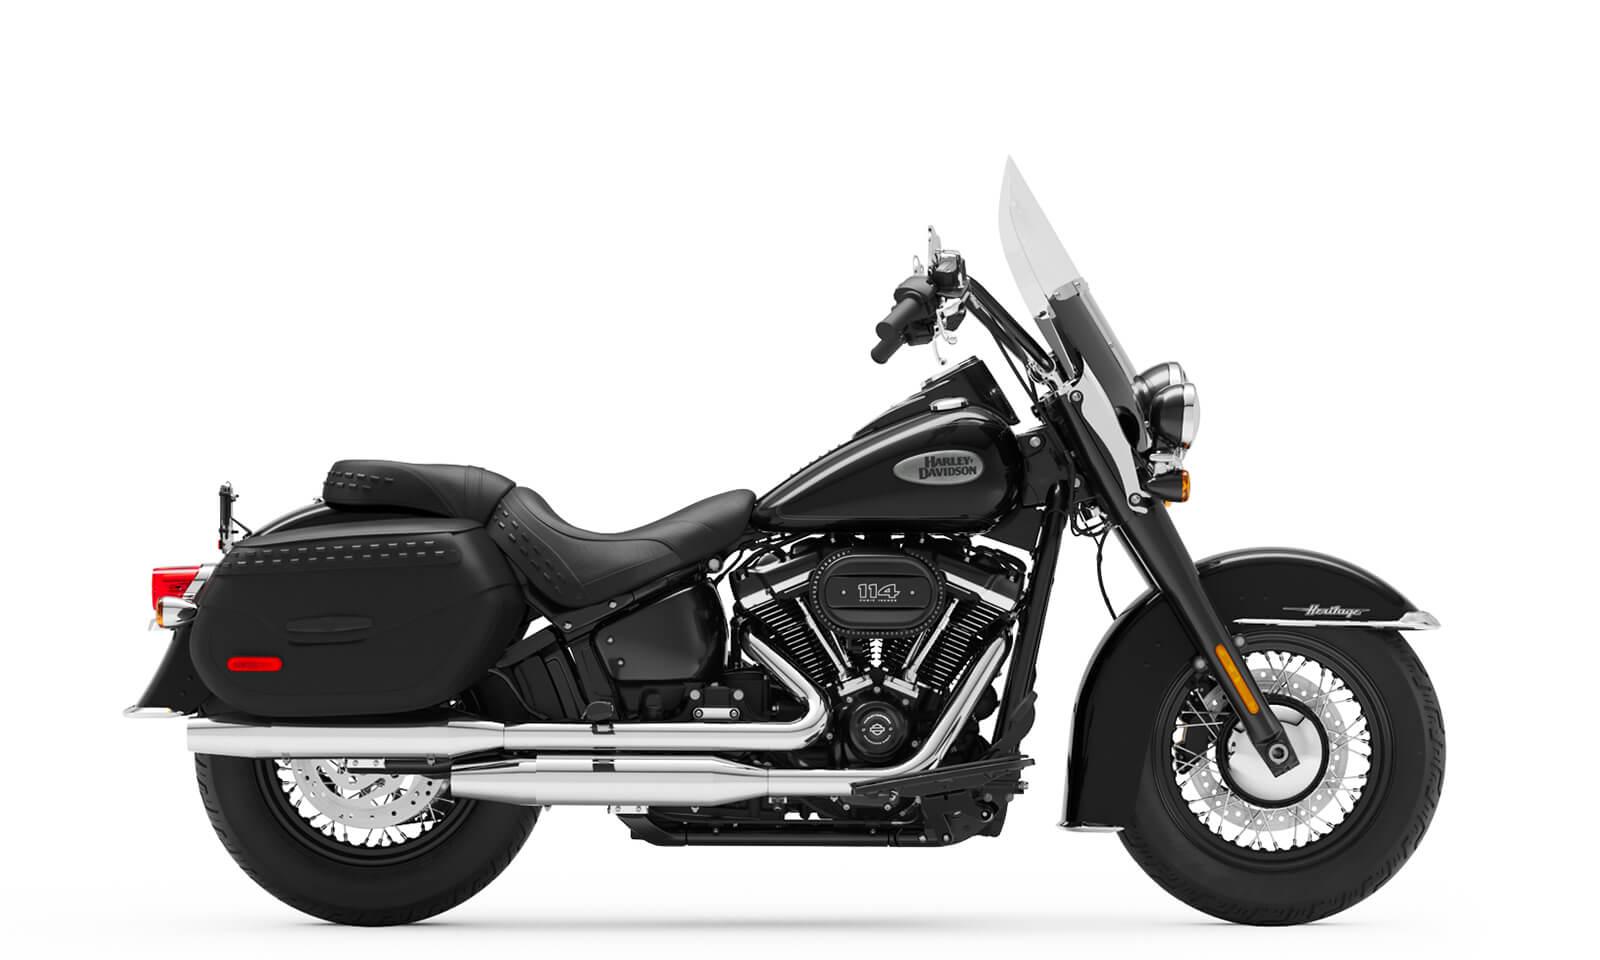 2021 Harley-Davidson Heritage Classic 114